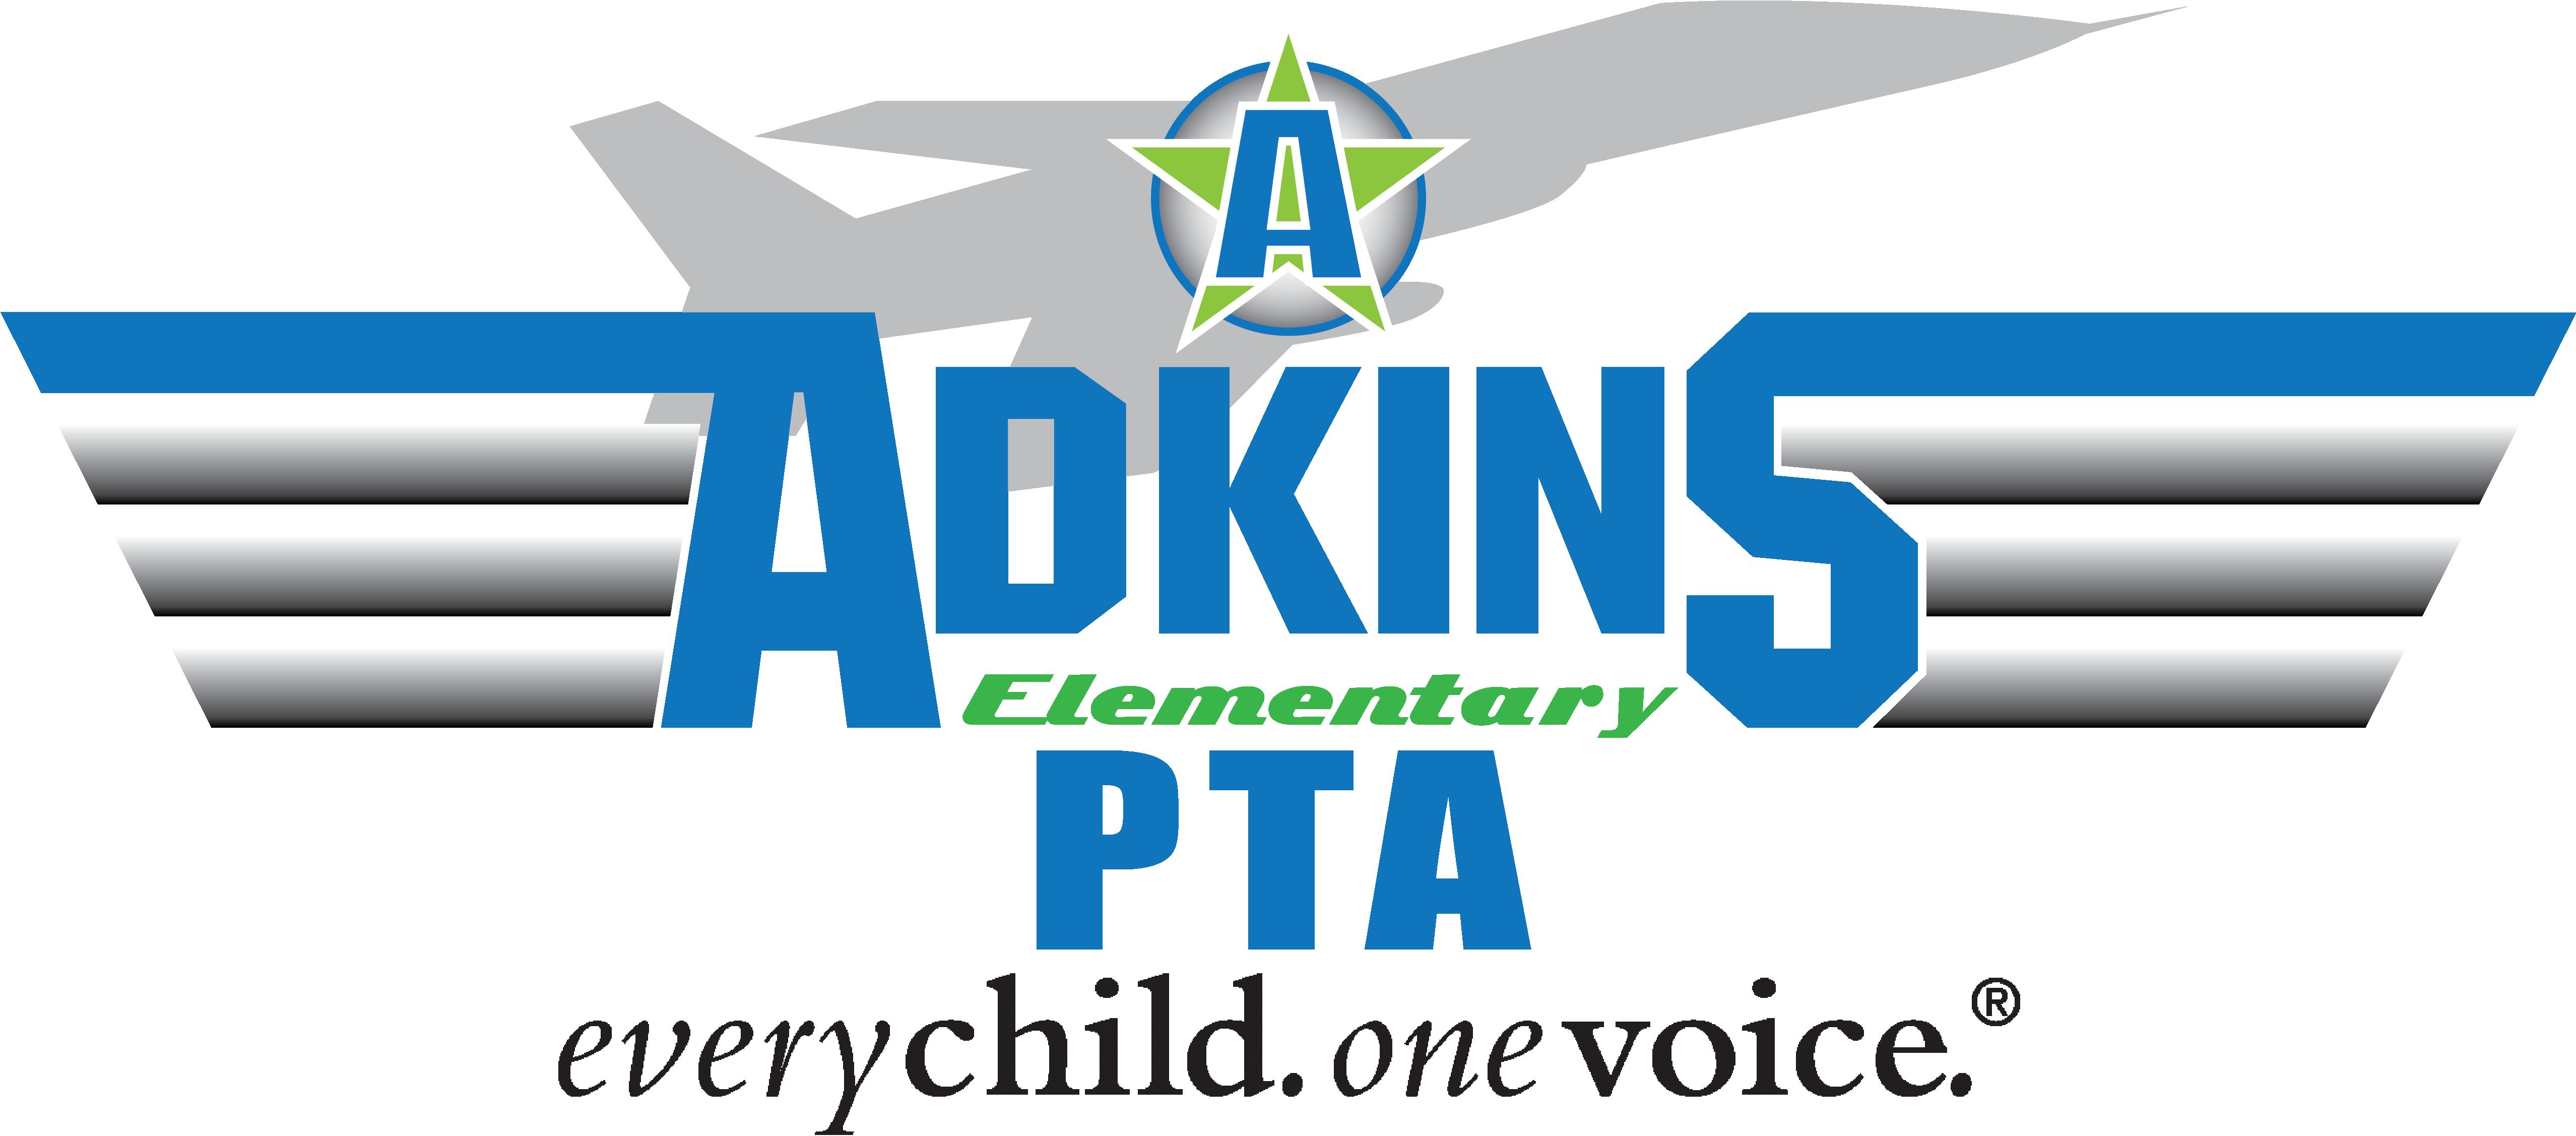 Adkins Elementary PTA.